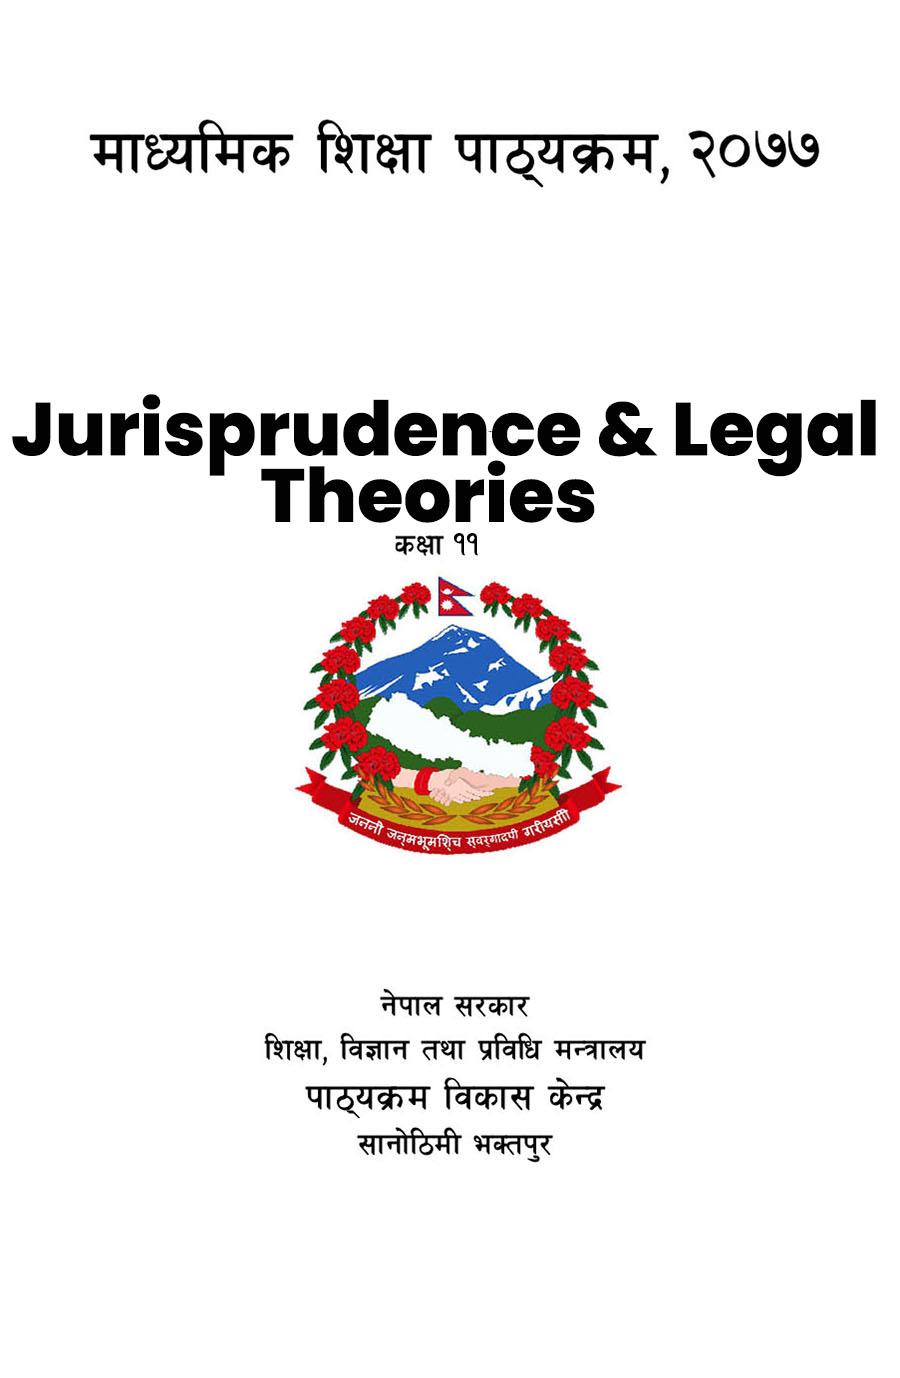 Grade-11-XI-Jurisprudence-and-Legal-Theories-Curriculum-Subject-Code-Jlt107-2076